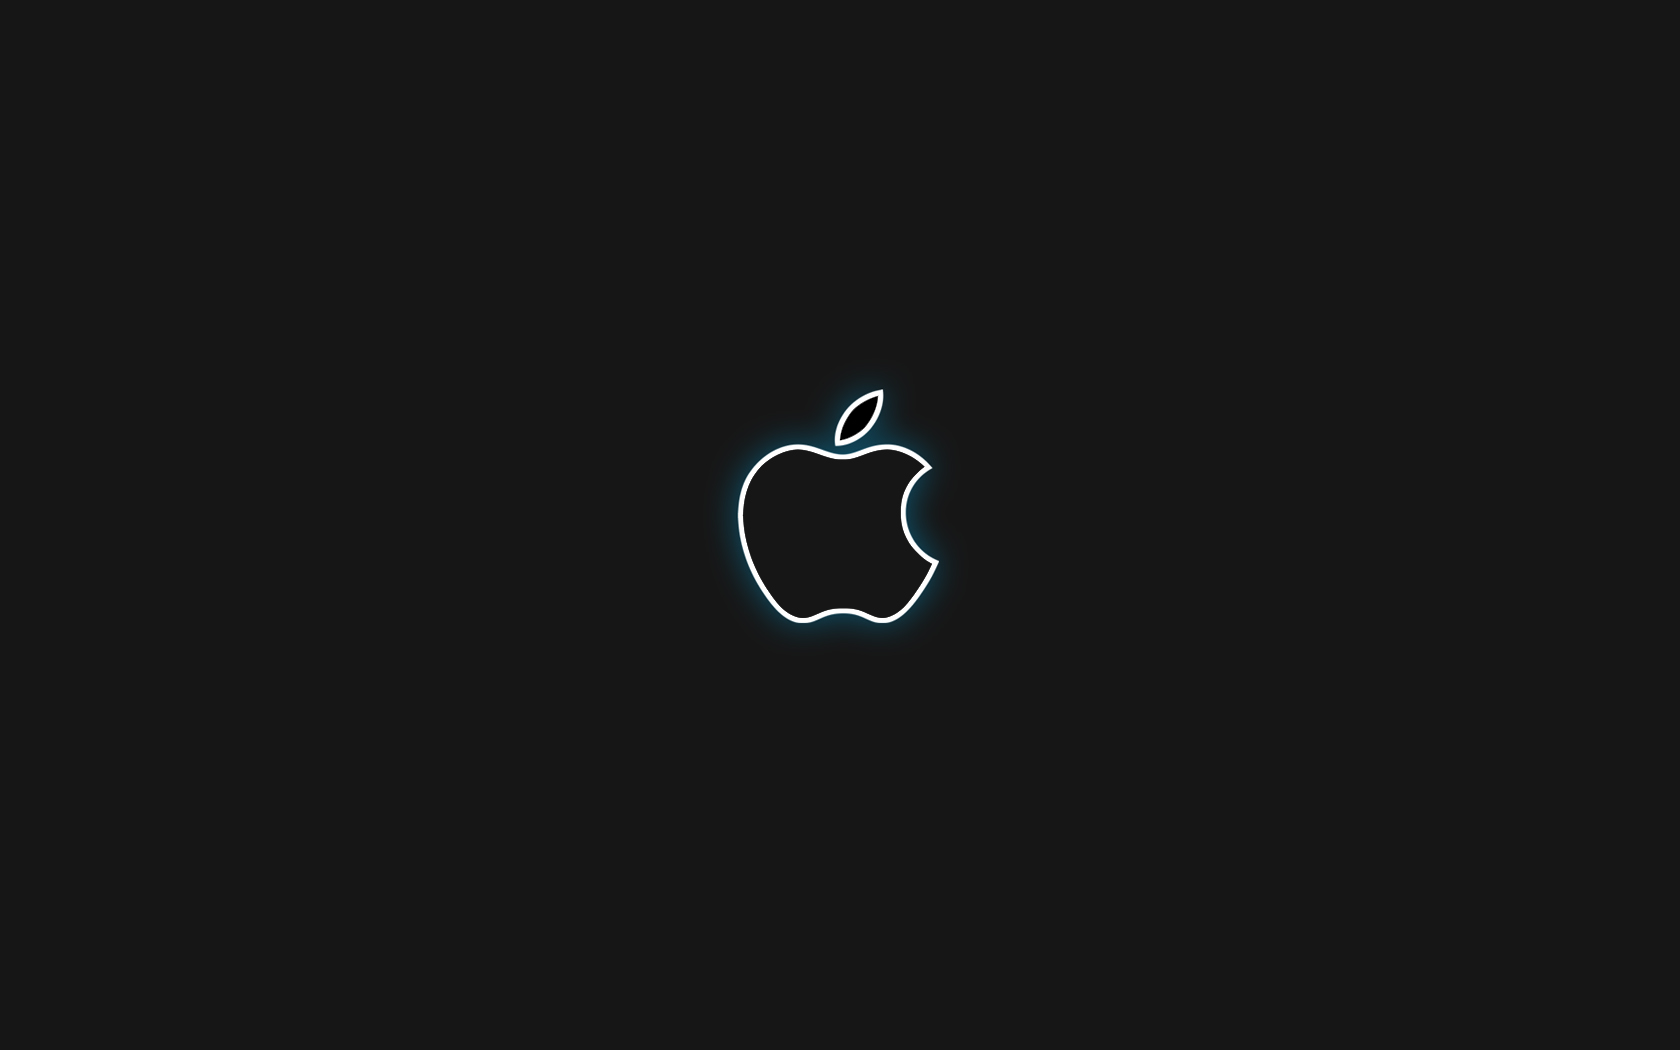 Apple logo hd desktop wallpaper widescreen high definition apple logo hd desktop wallpaper widescreen high definition 1680x1050 biocorpaavc Choice Image